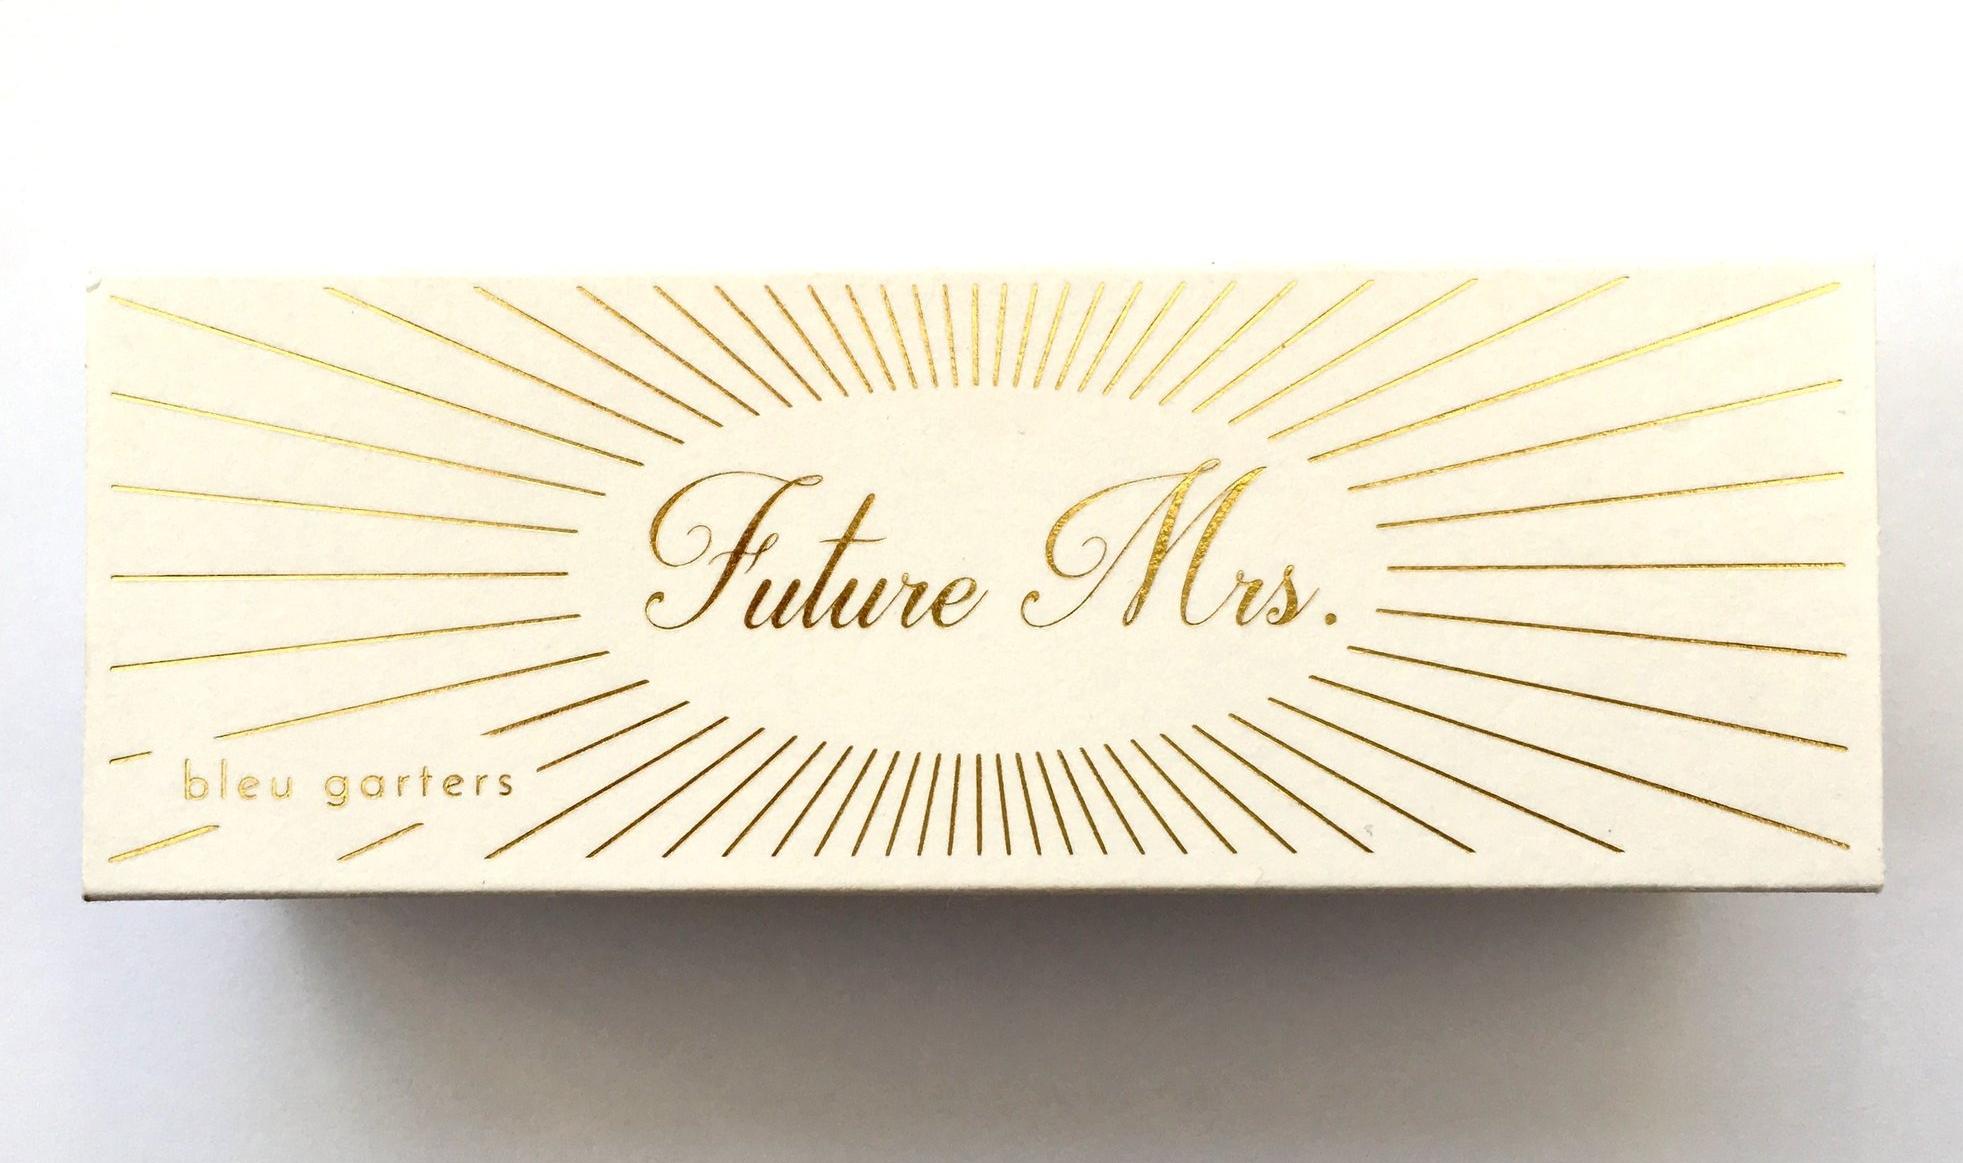 Future Mrs. gift box